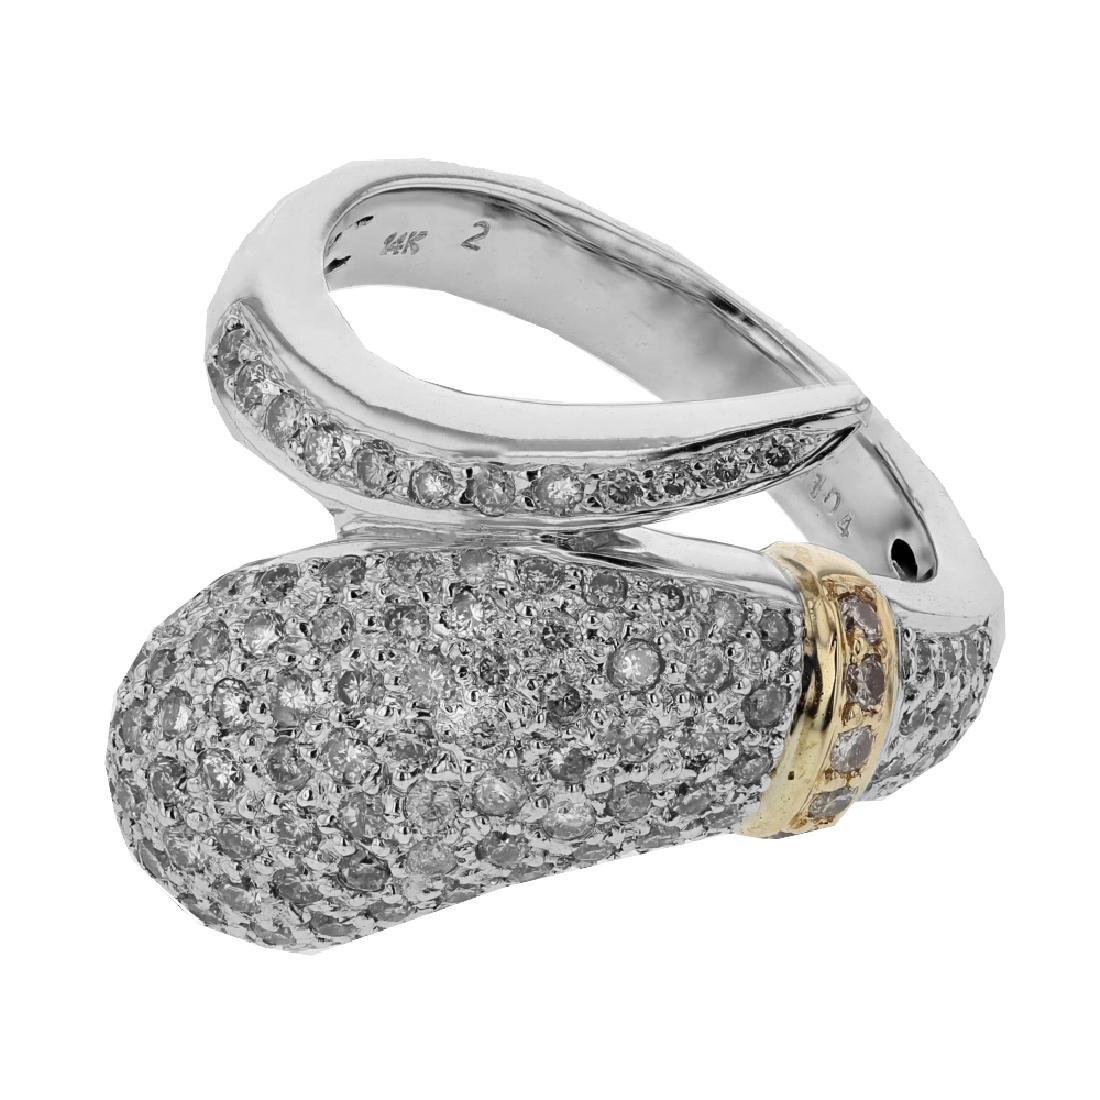 1.04 CTW Diamond Fashion  Ring in 14K Two Tone Yellow